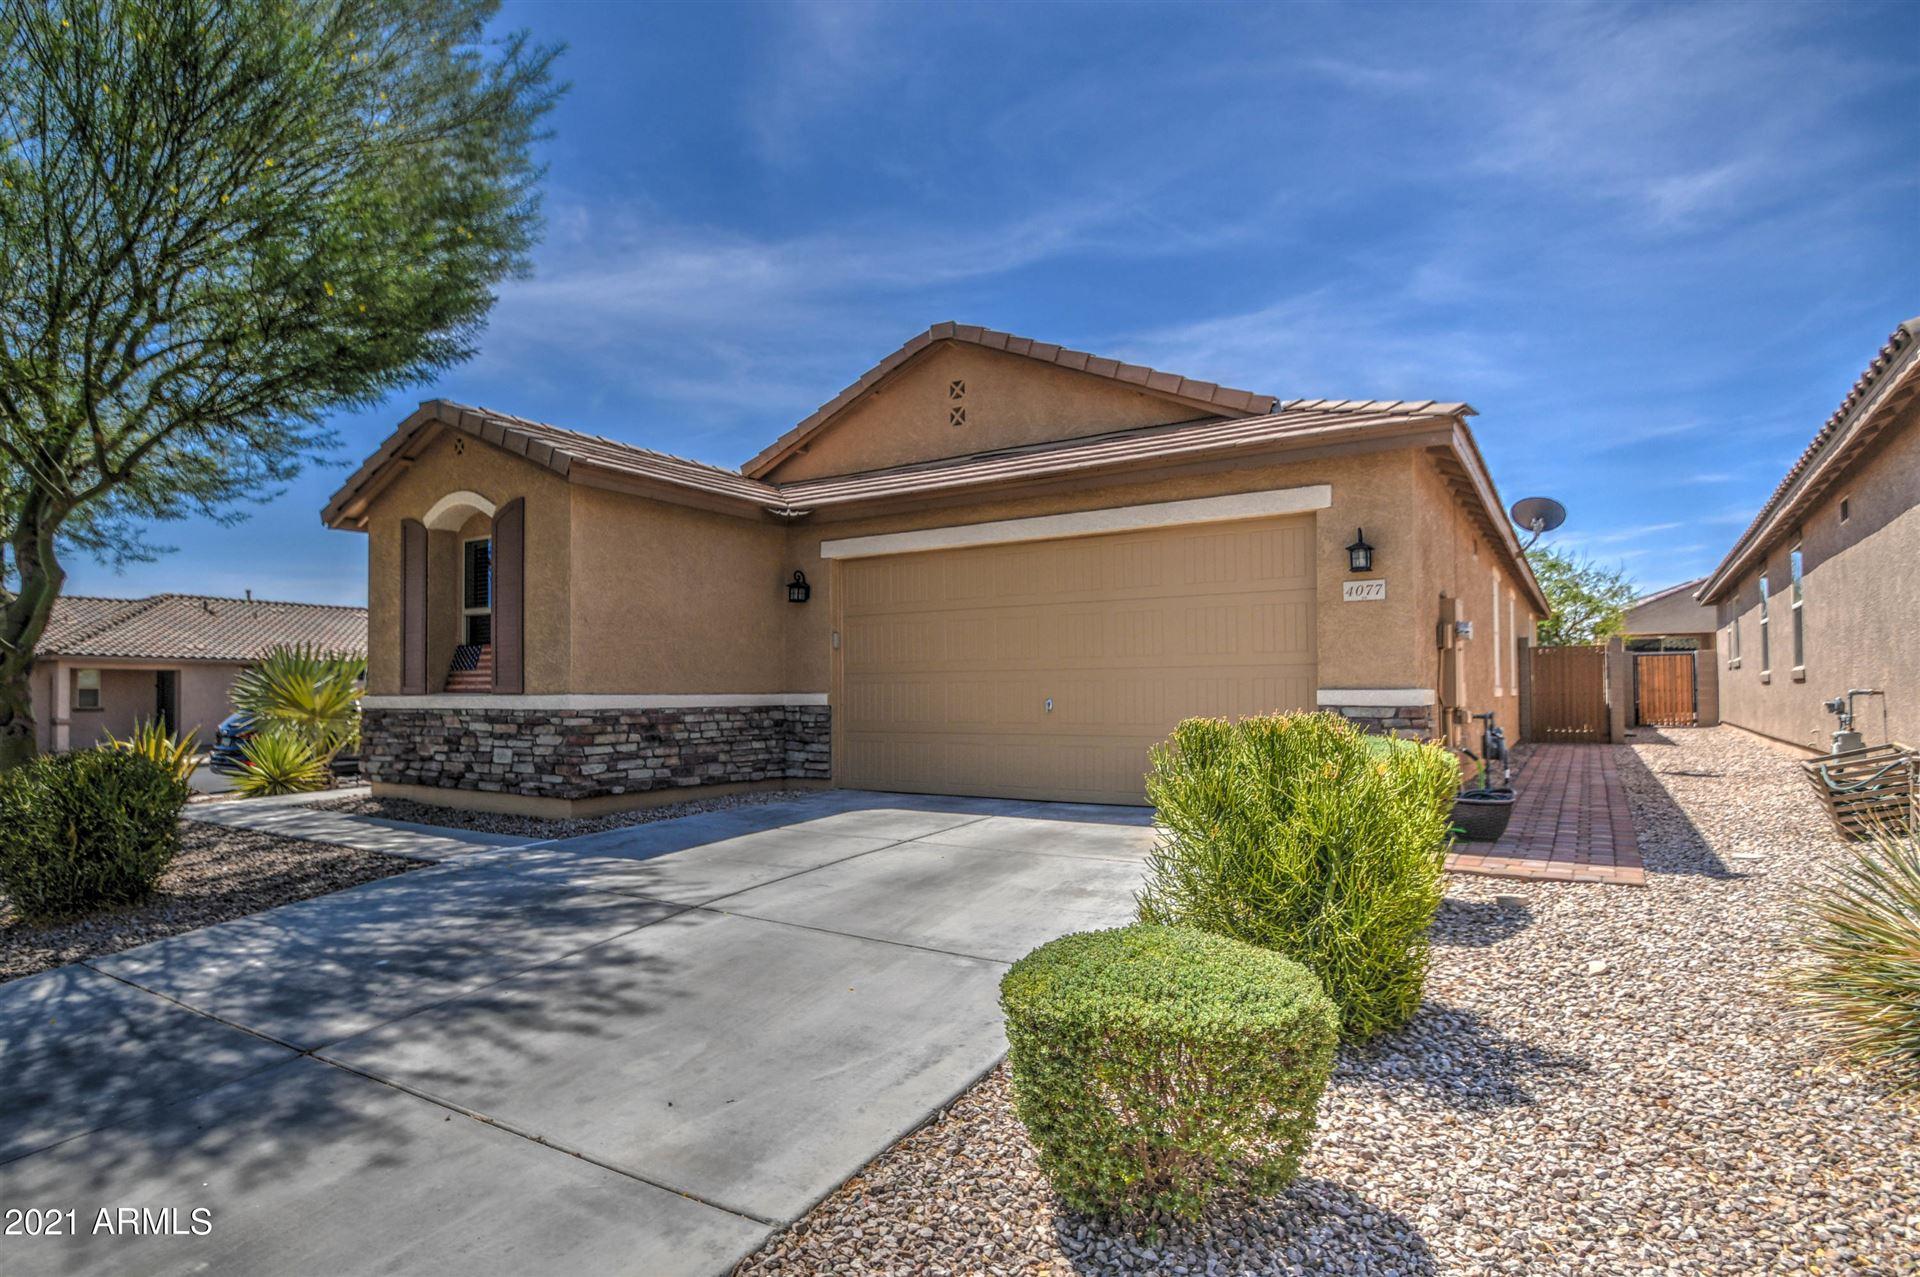 4077 W Kirkland Avenue, Queen Creek, AZ 85142 - MLS#: 6262617